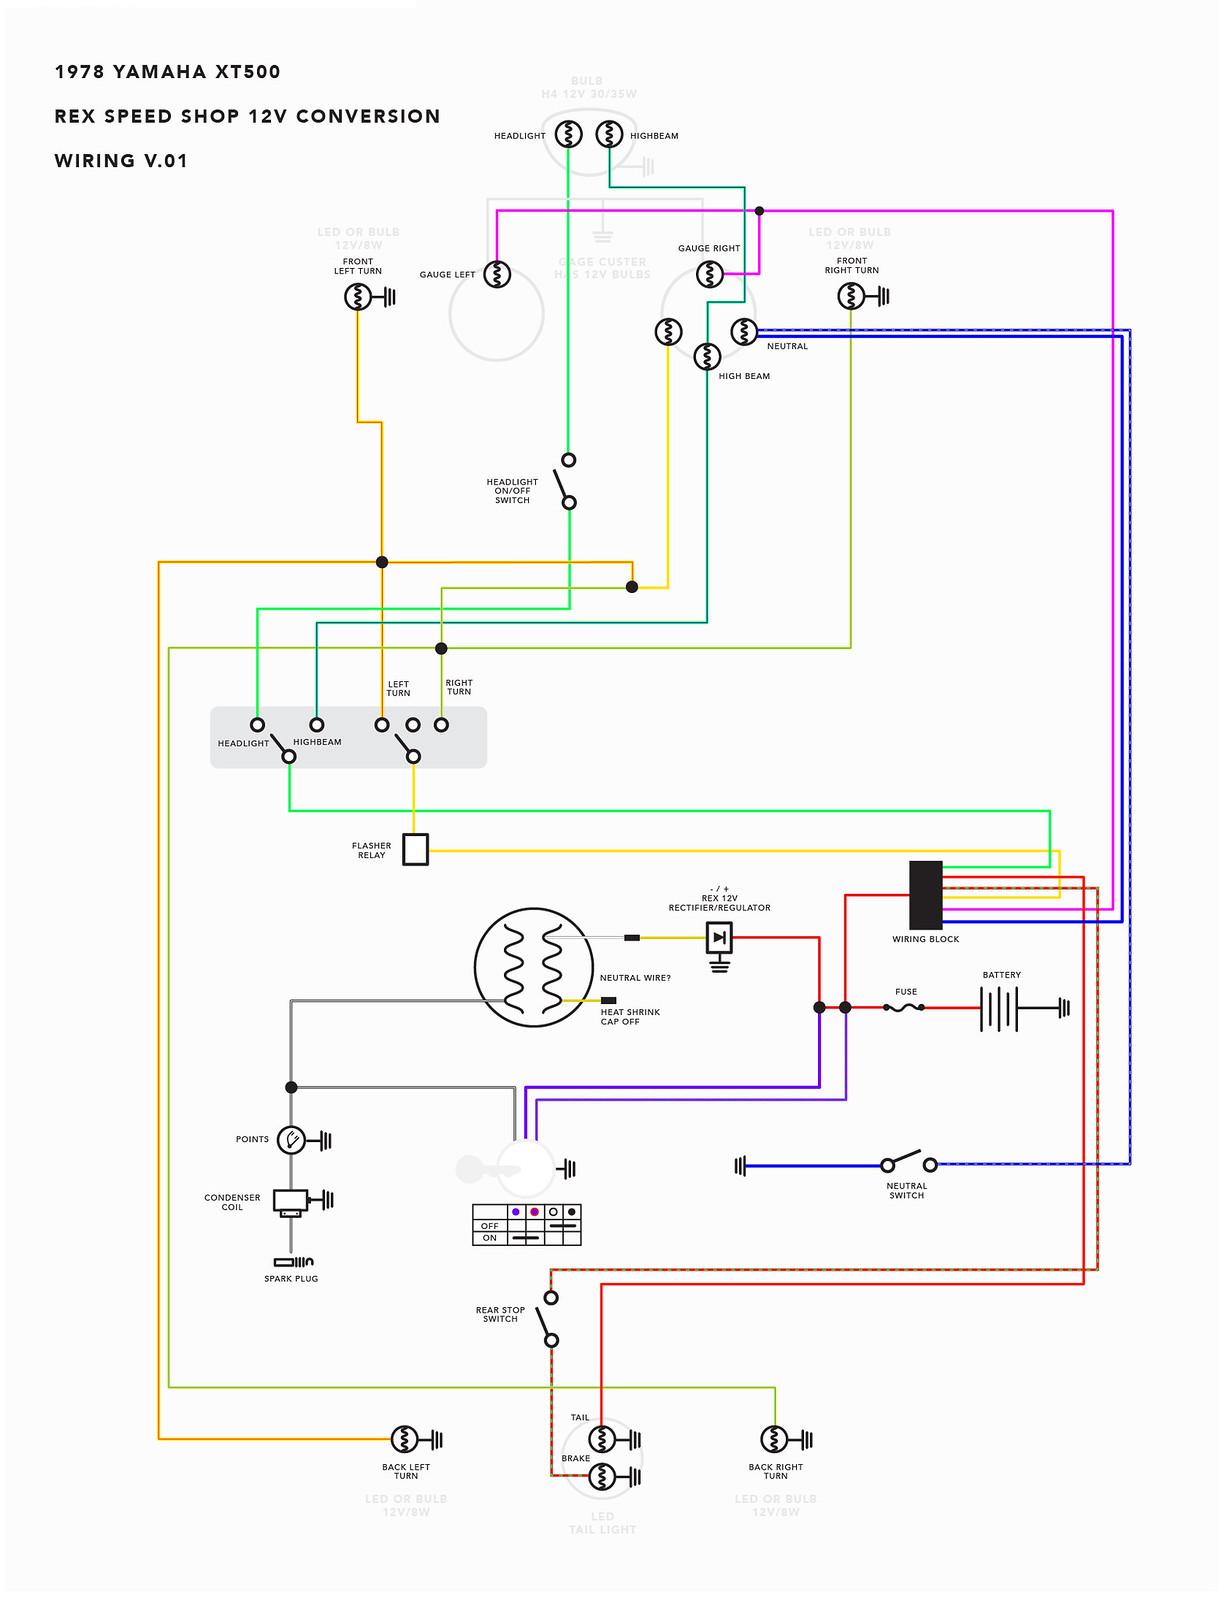 Diagram Yamaha Xt500 Wiring Diagram Full Version Hd Quality Wiring Diagram Ncwiring27 Newsetvlucera It